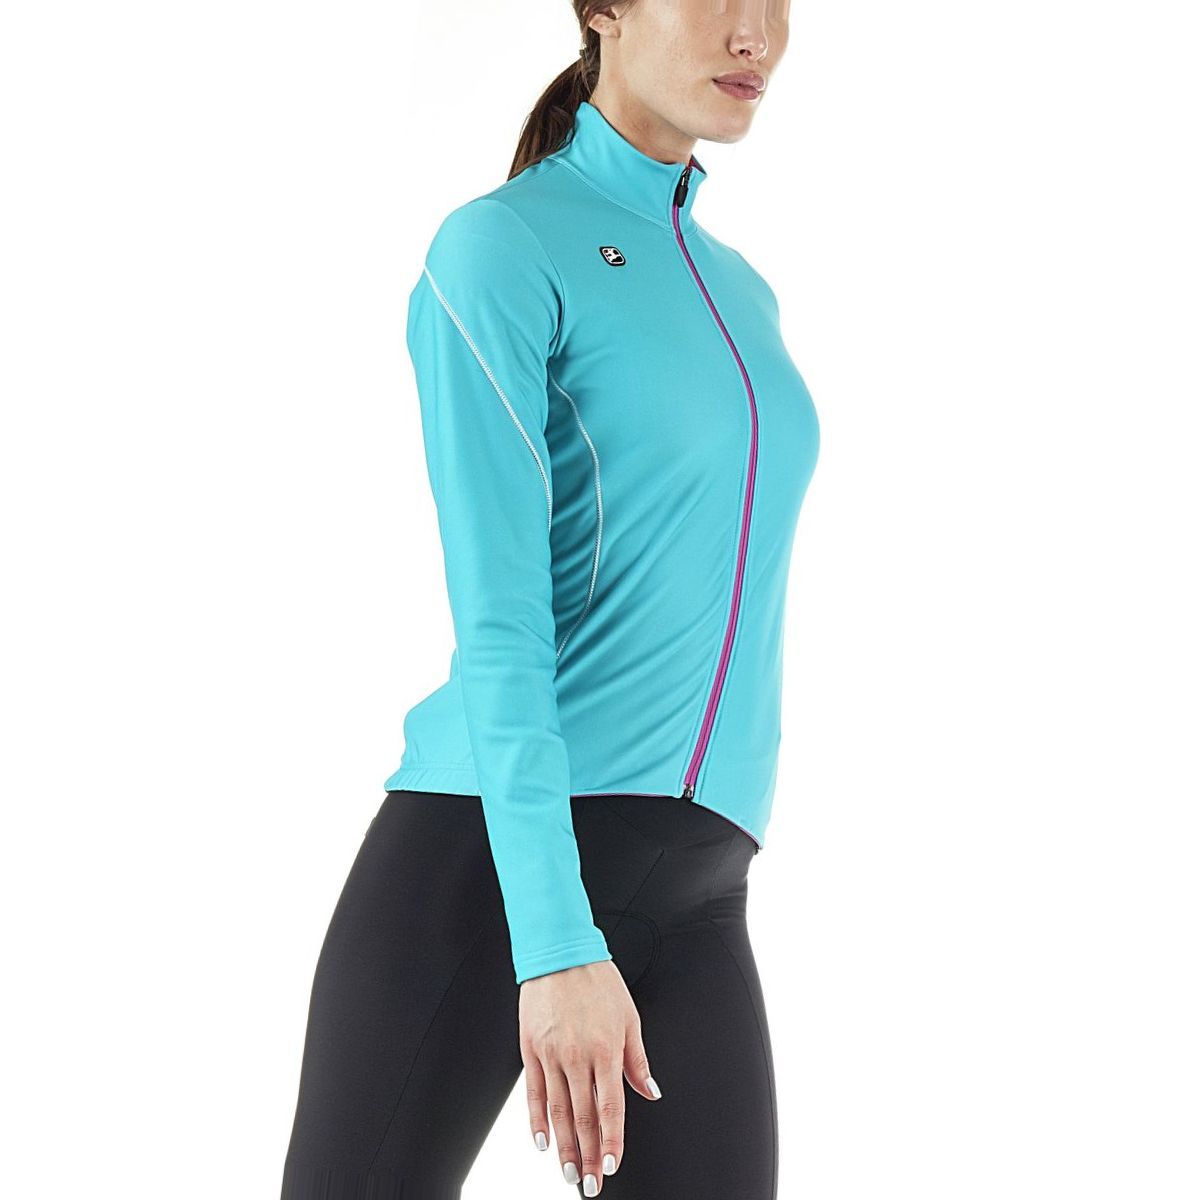 Giordana Fusion Long-Sleeve Jersey - Women's